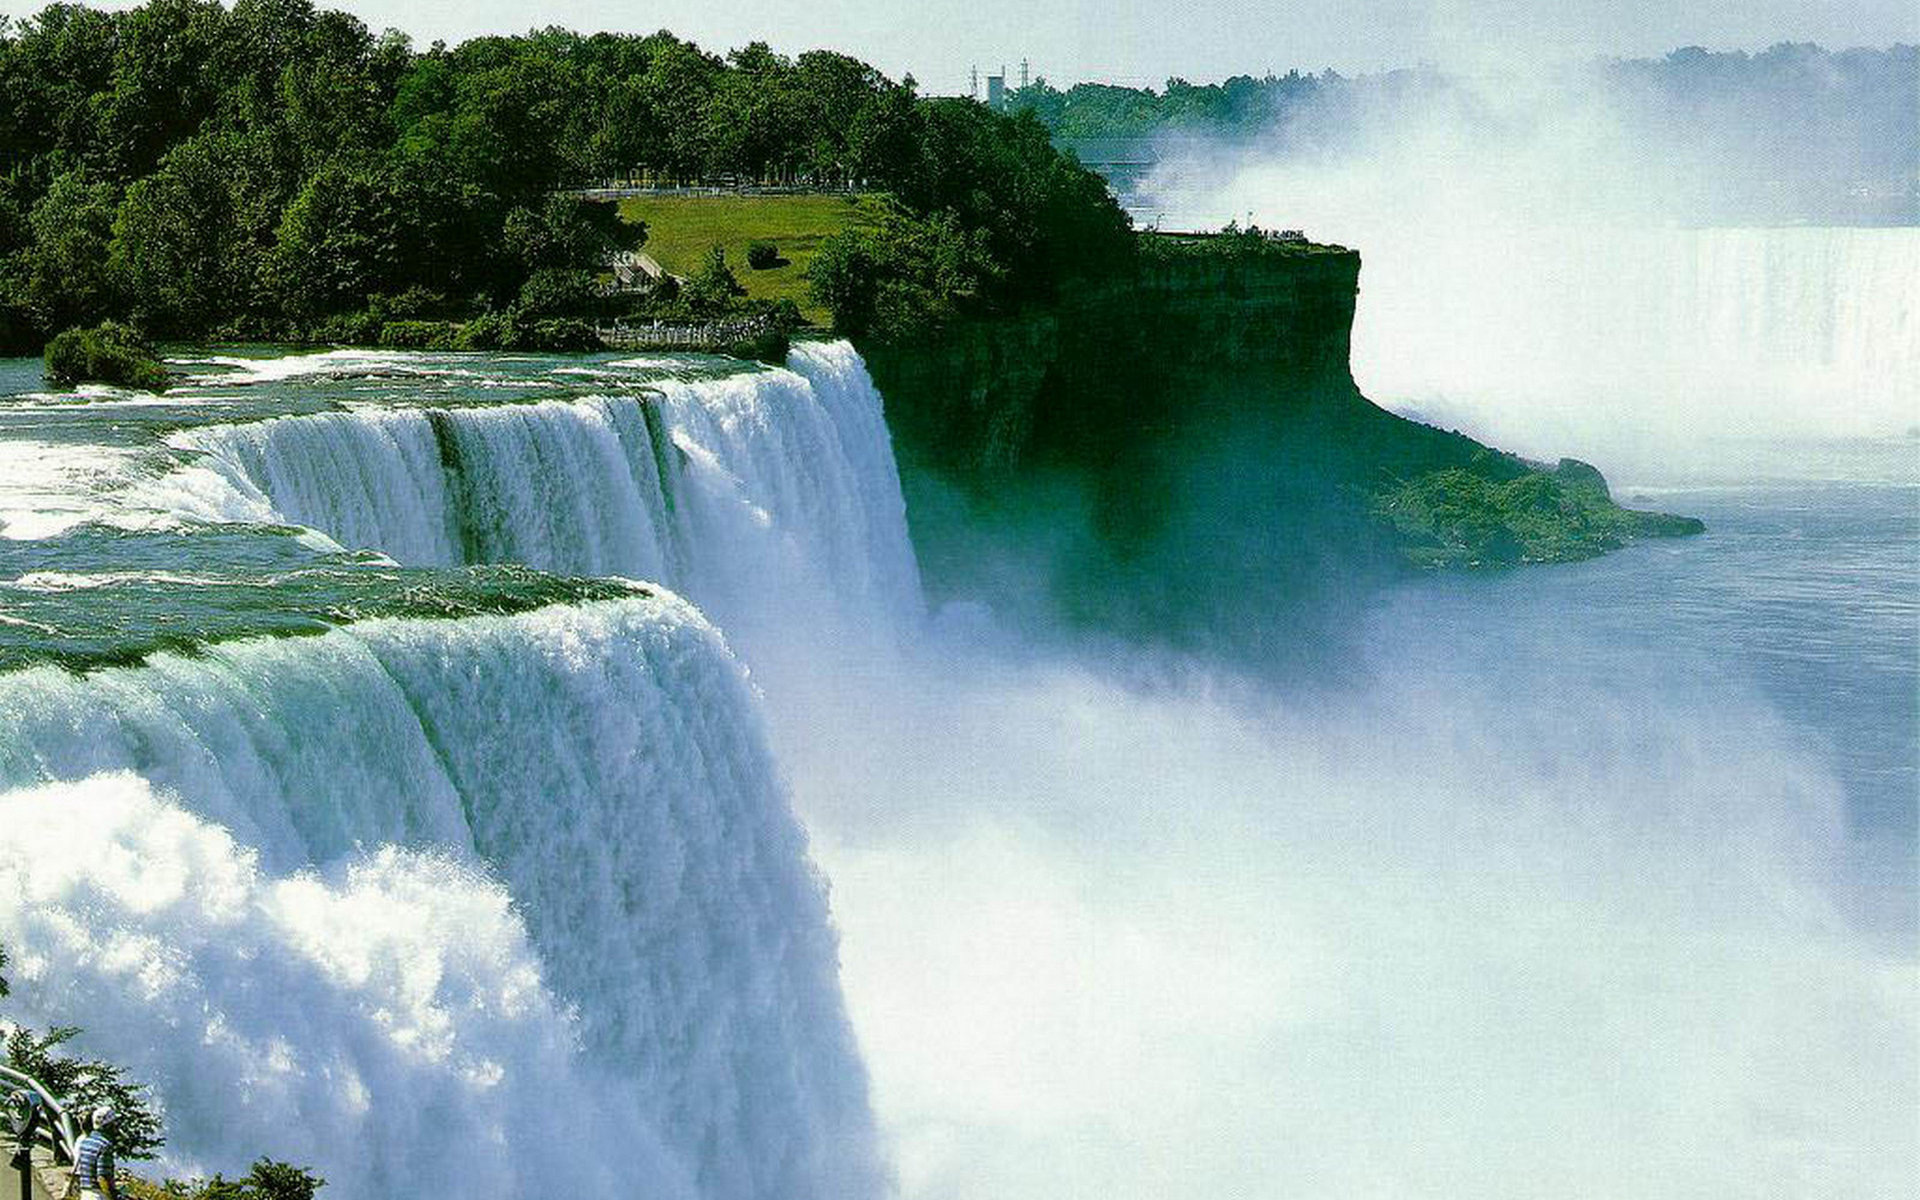 обои река, течение, обрыв, водопады картинки фото